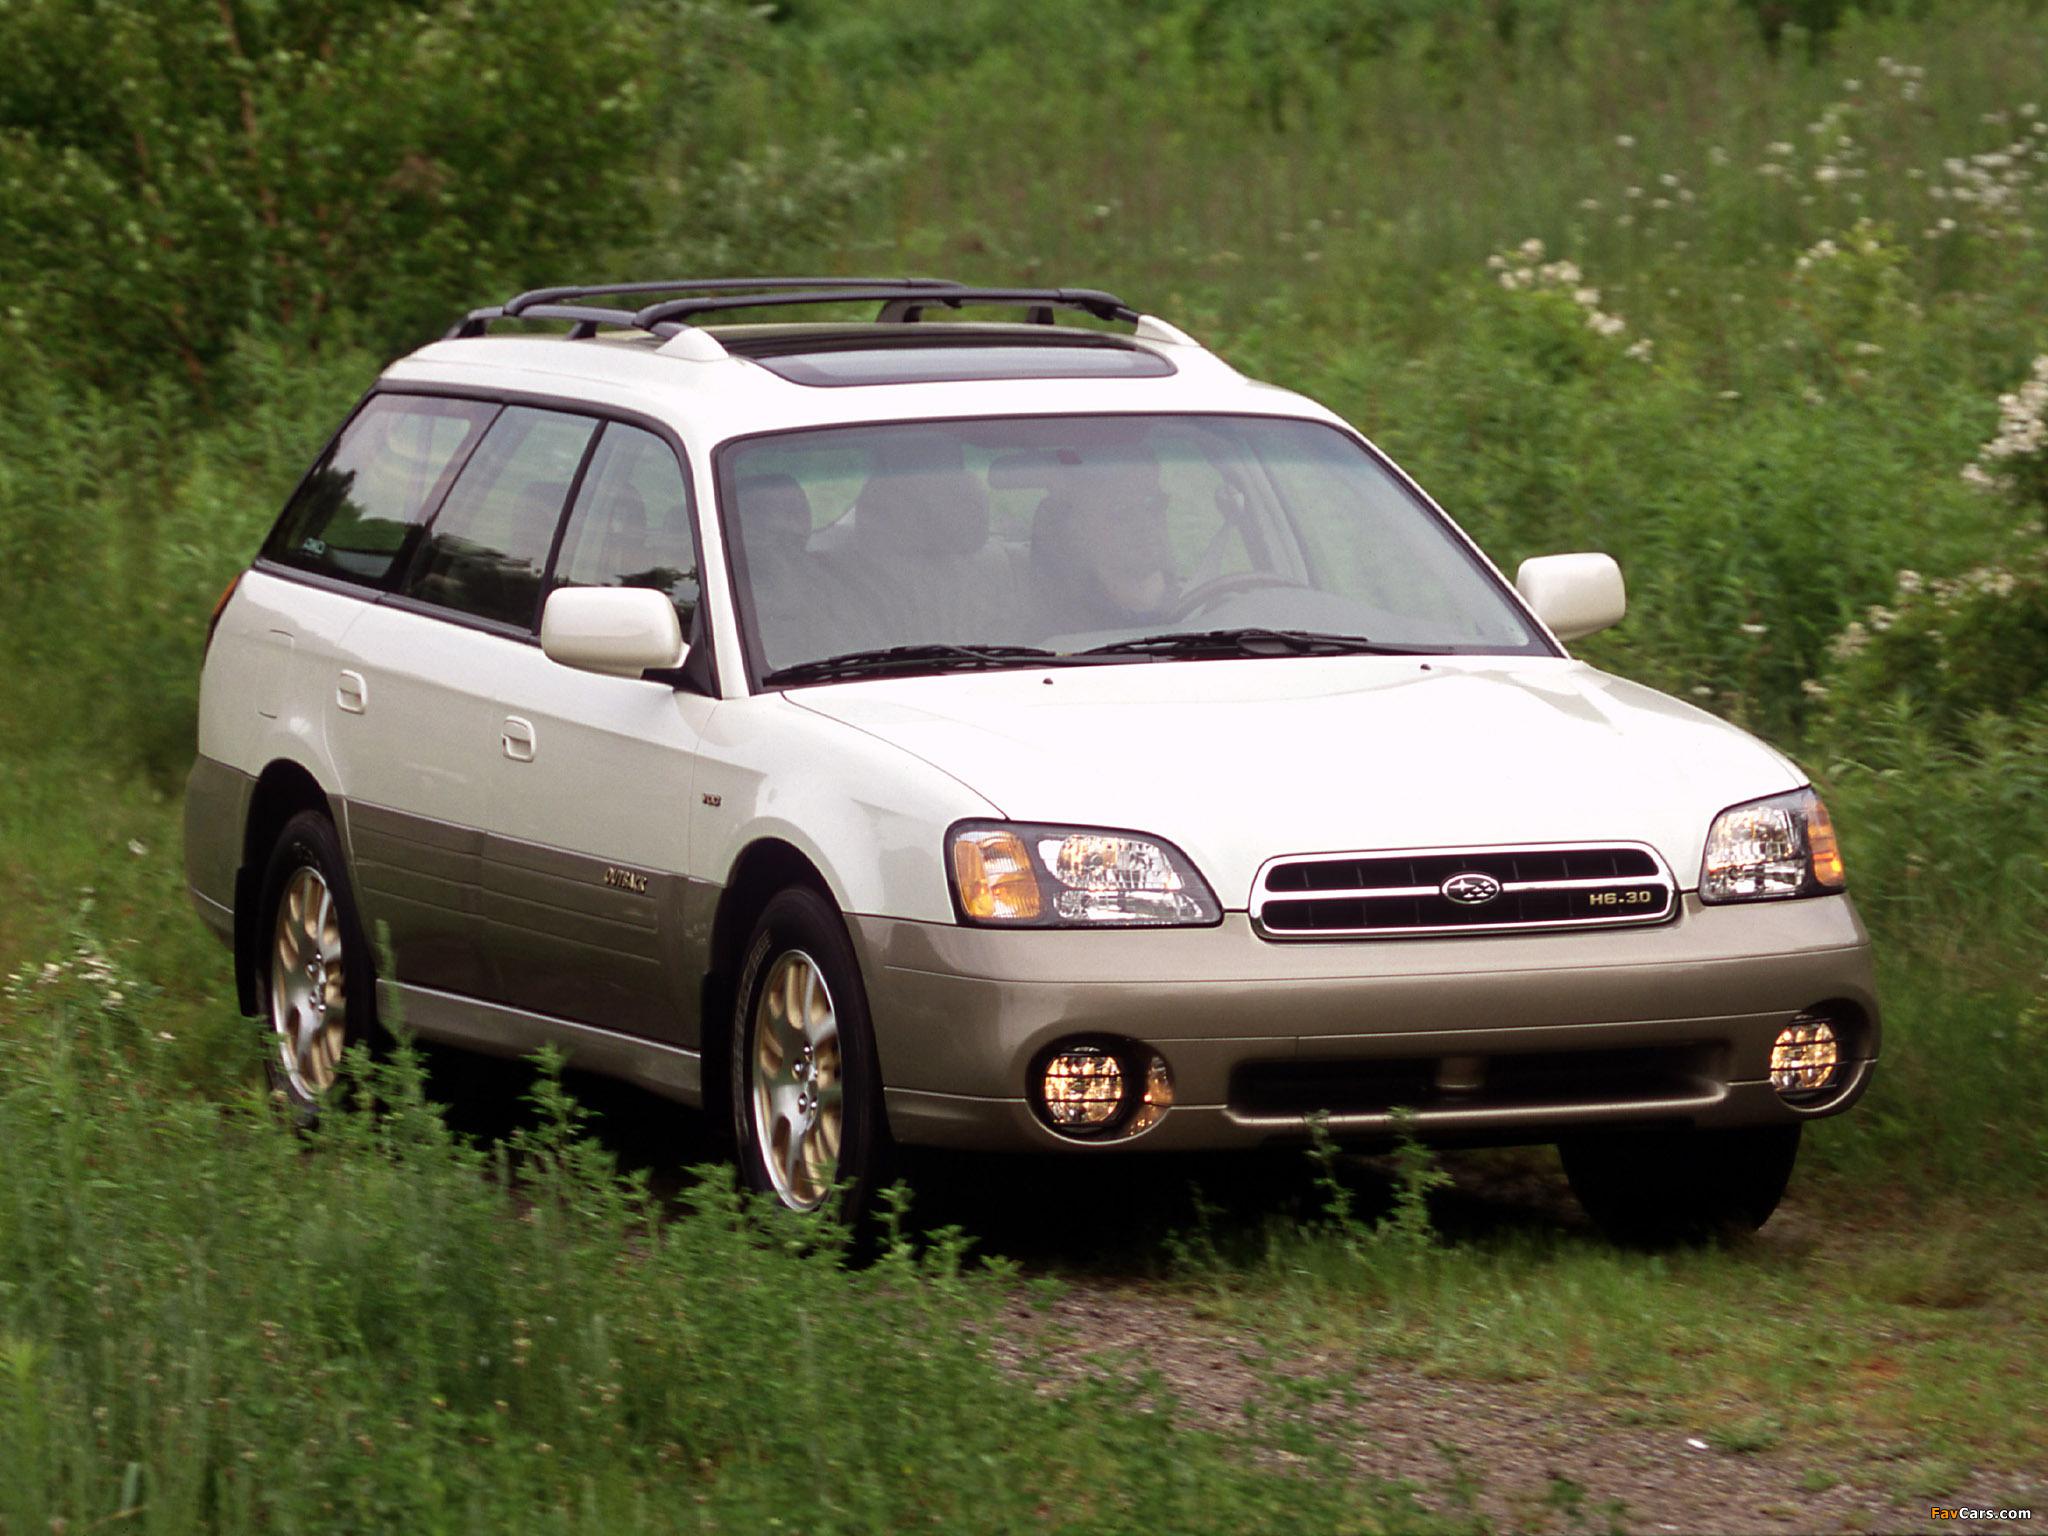 Photos Of Subaru Outback H6 30 Us Spec 200003 2048x1536 2000 Legacy 2048 X